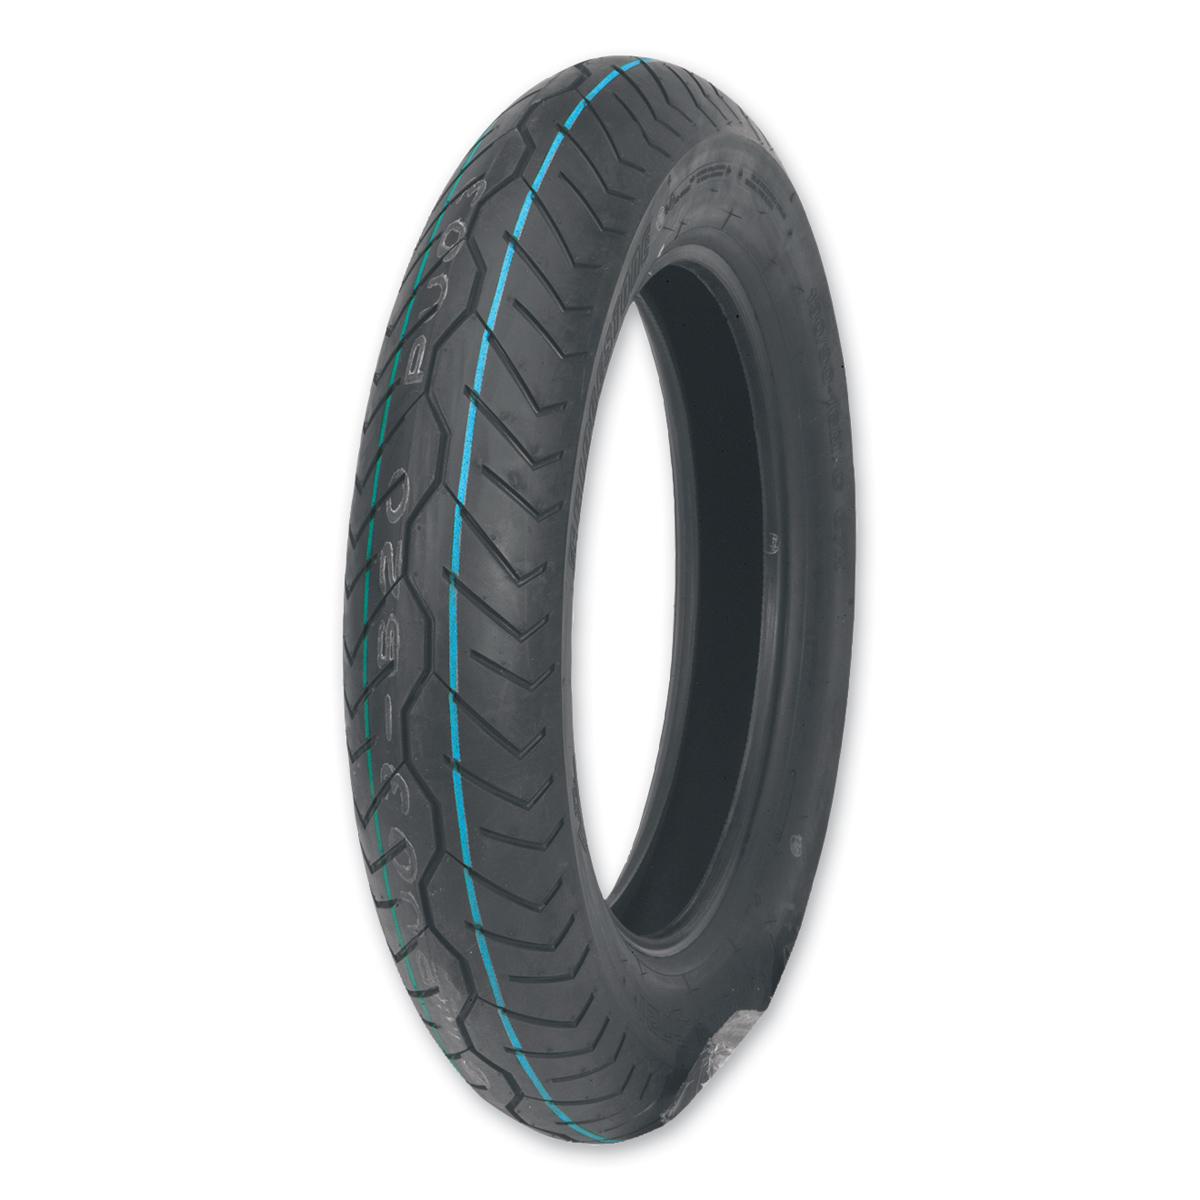 Bridgestone G721-F 100/90-19  Front Tire